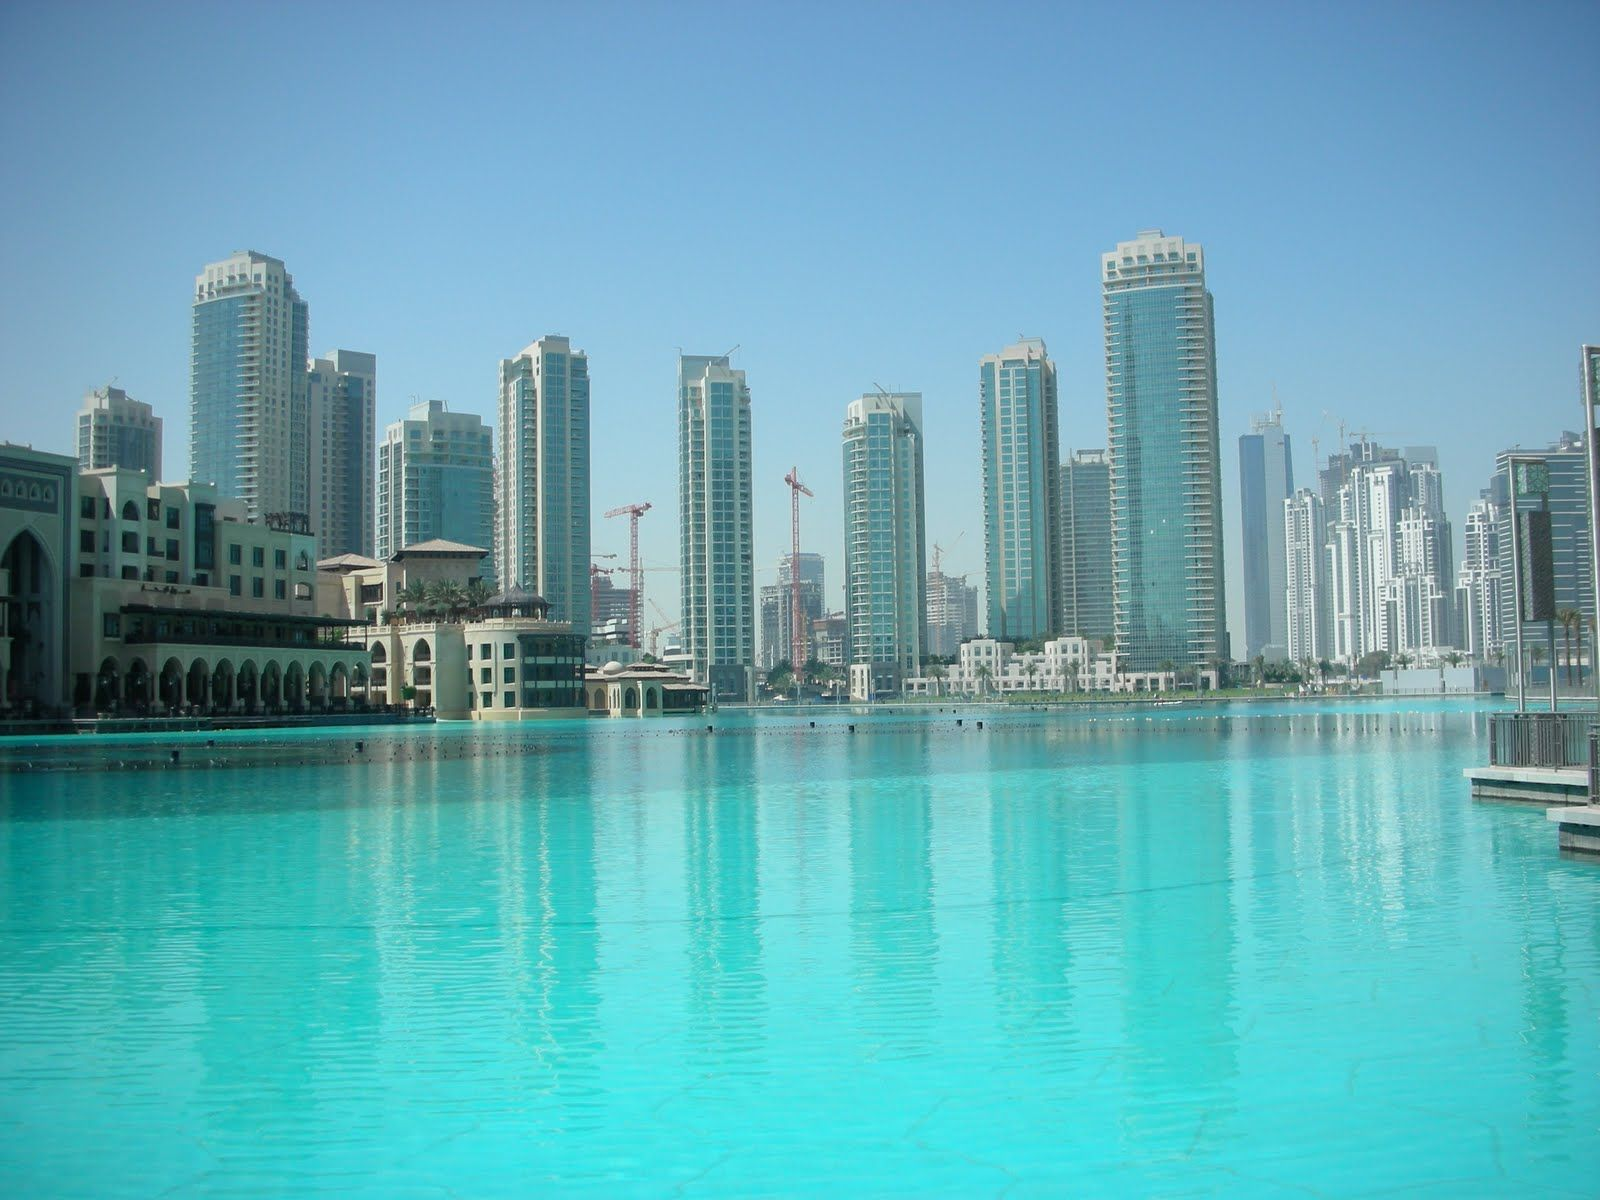 Hd Images Of Dubai